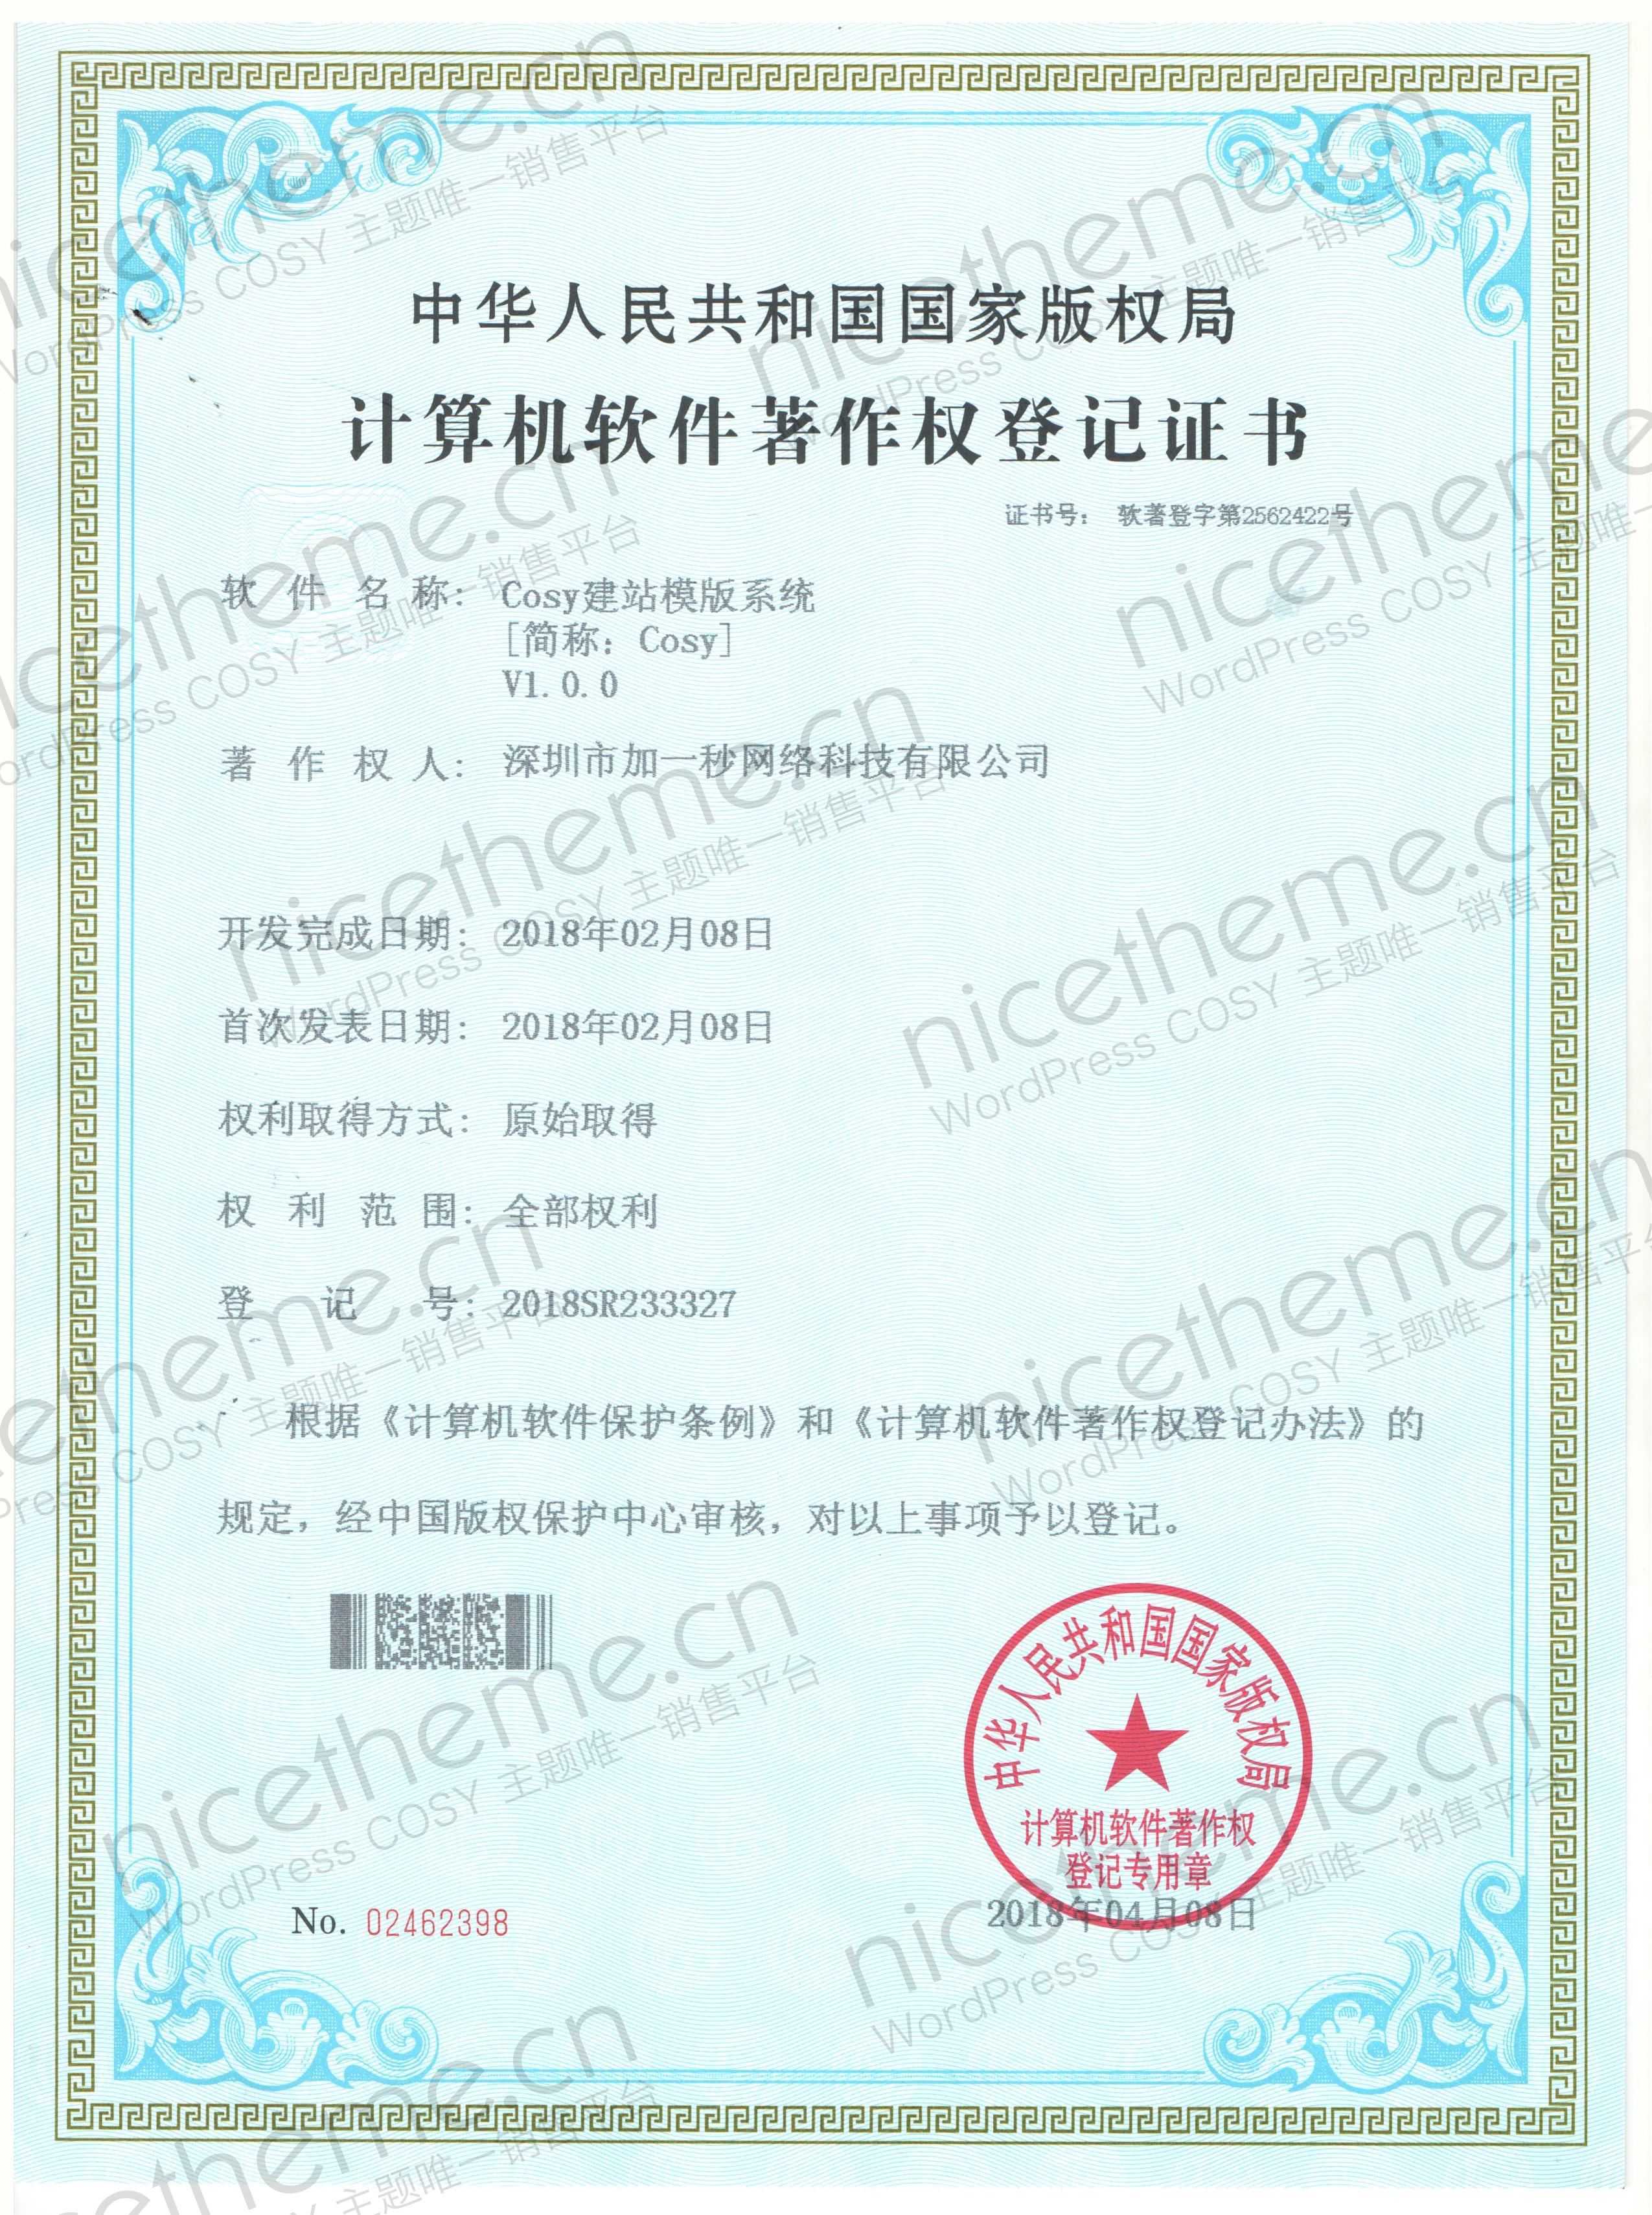 Cosy主题已获得国家认证计算机软件著作权-nicetheme